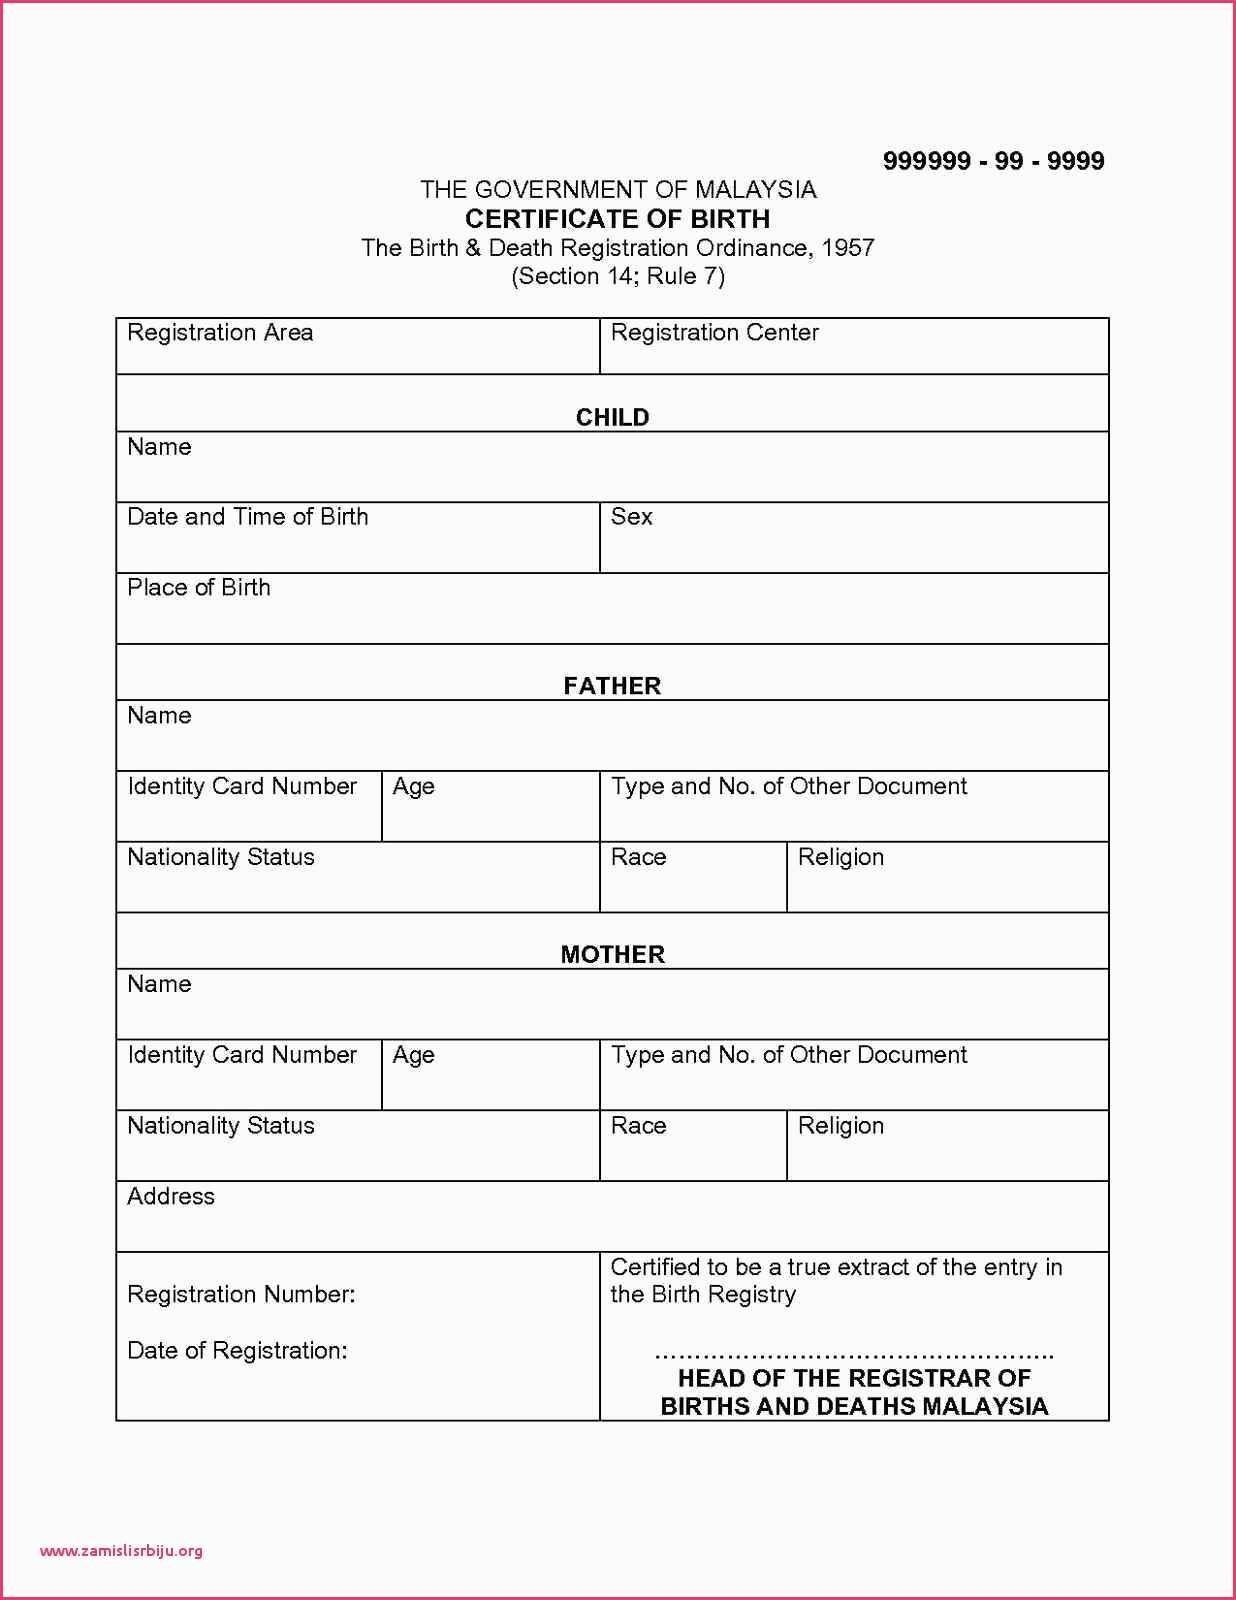 Birth Certificate Worksheet California  Briefencounters Or Birth Certificate Worksheet California